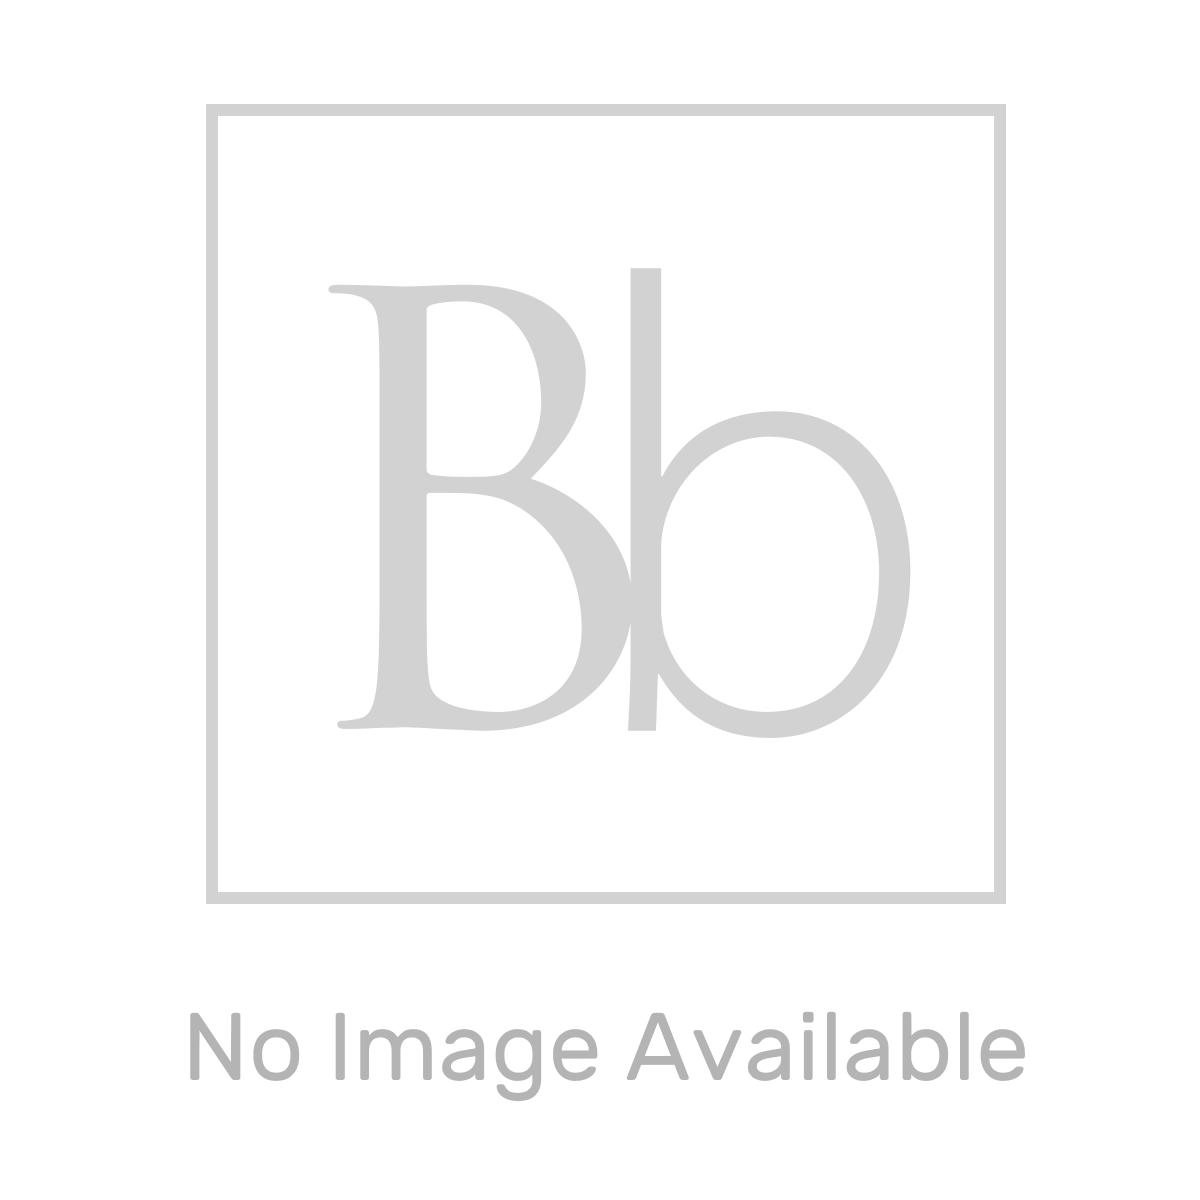 RAK Series 600 Hand Basin 400mm Lifestyle